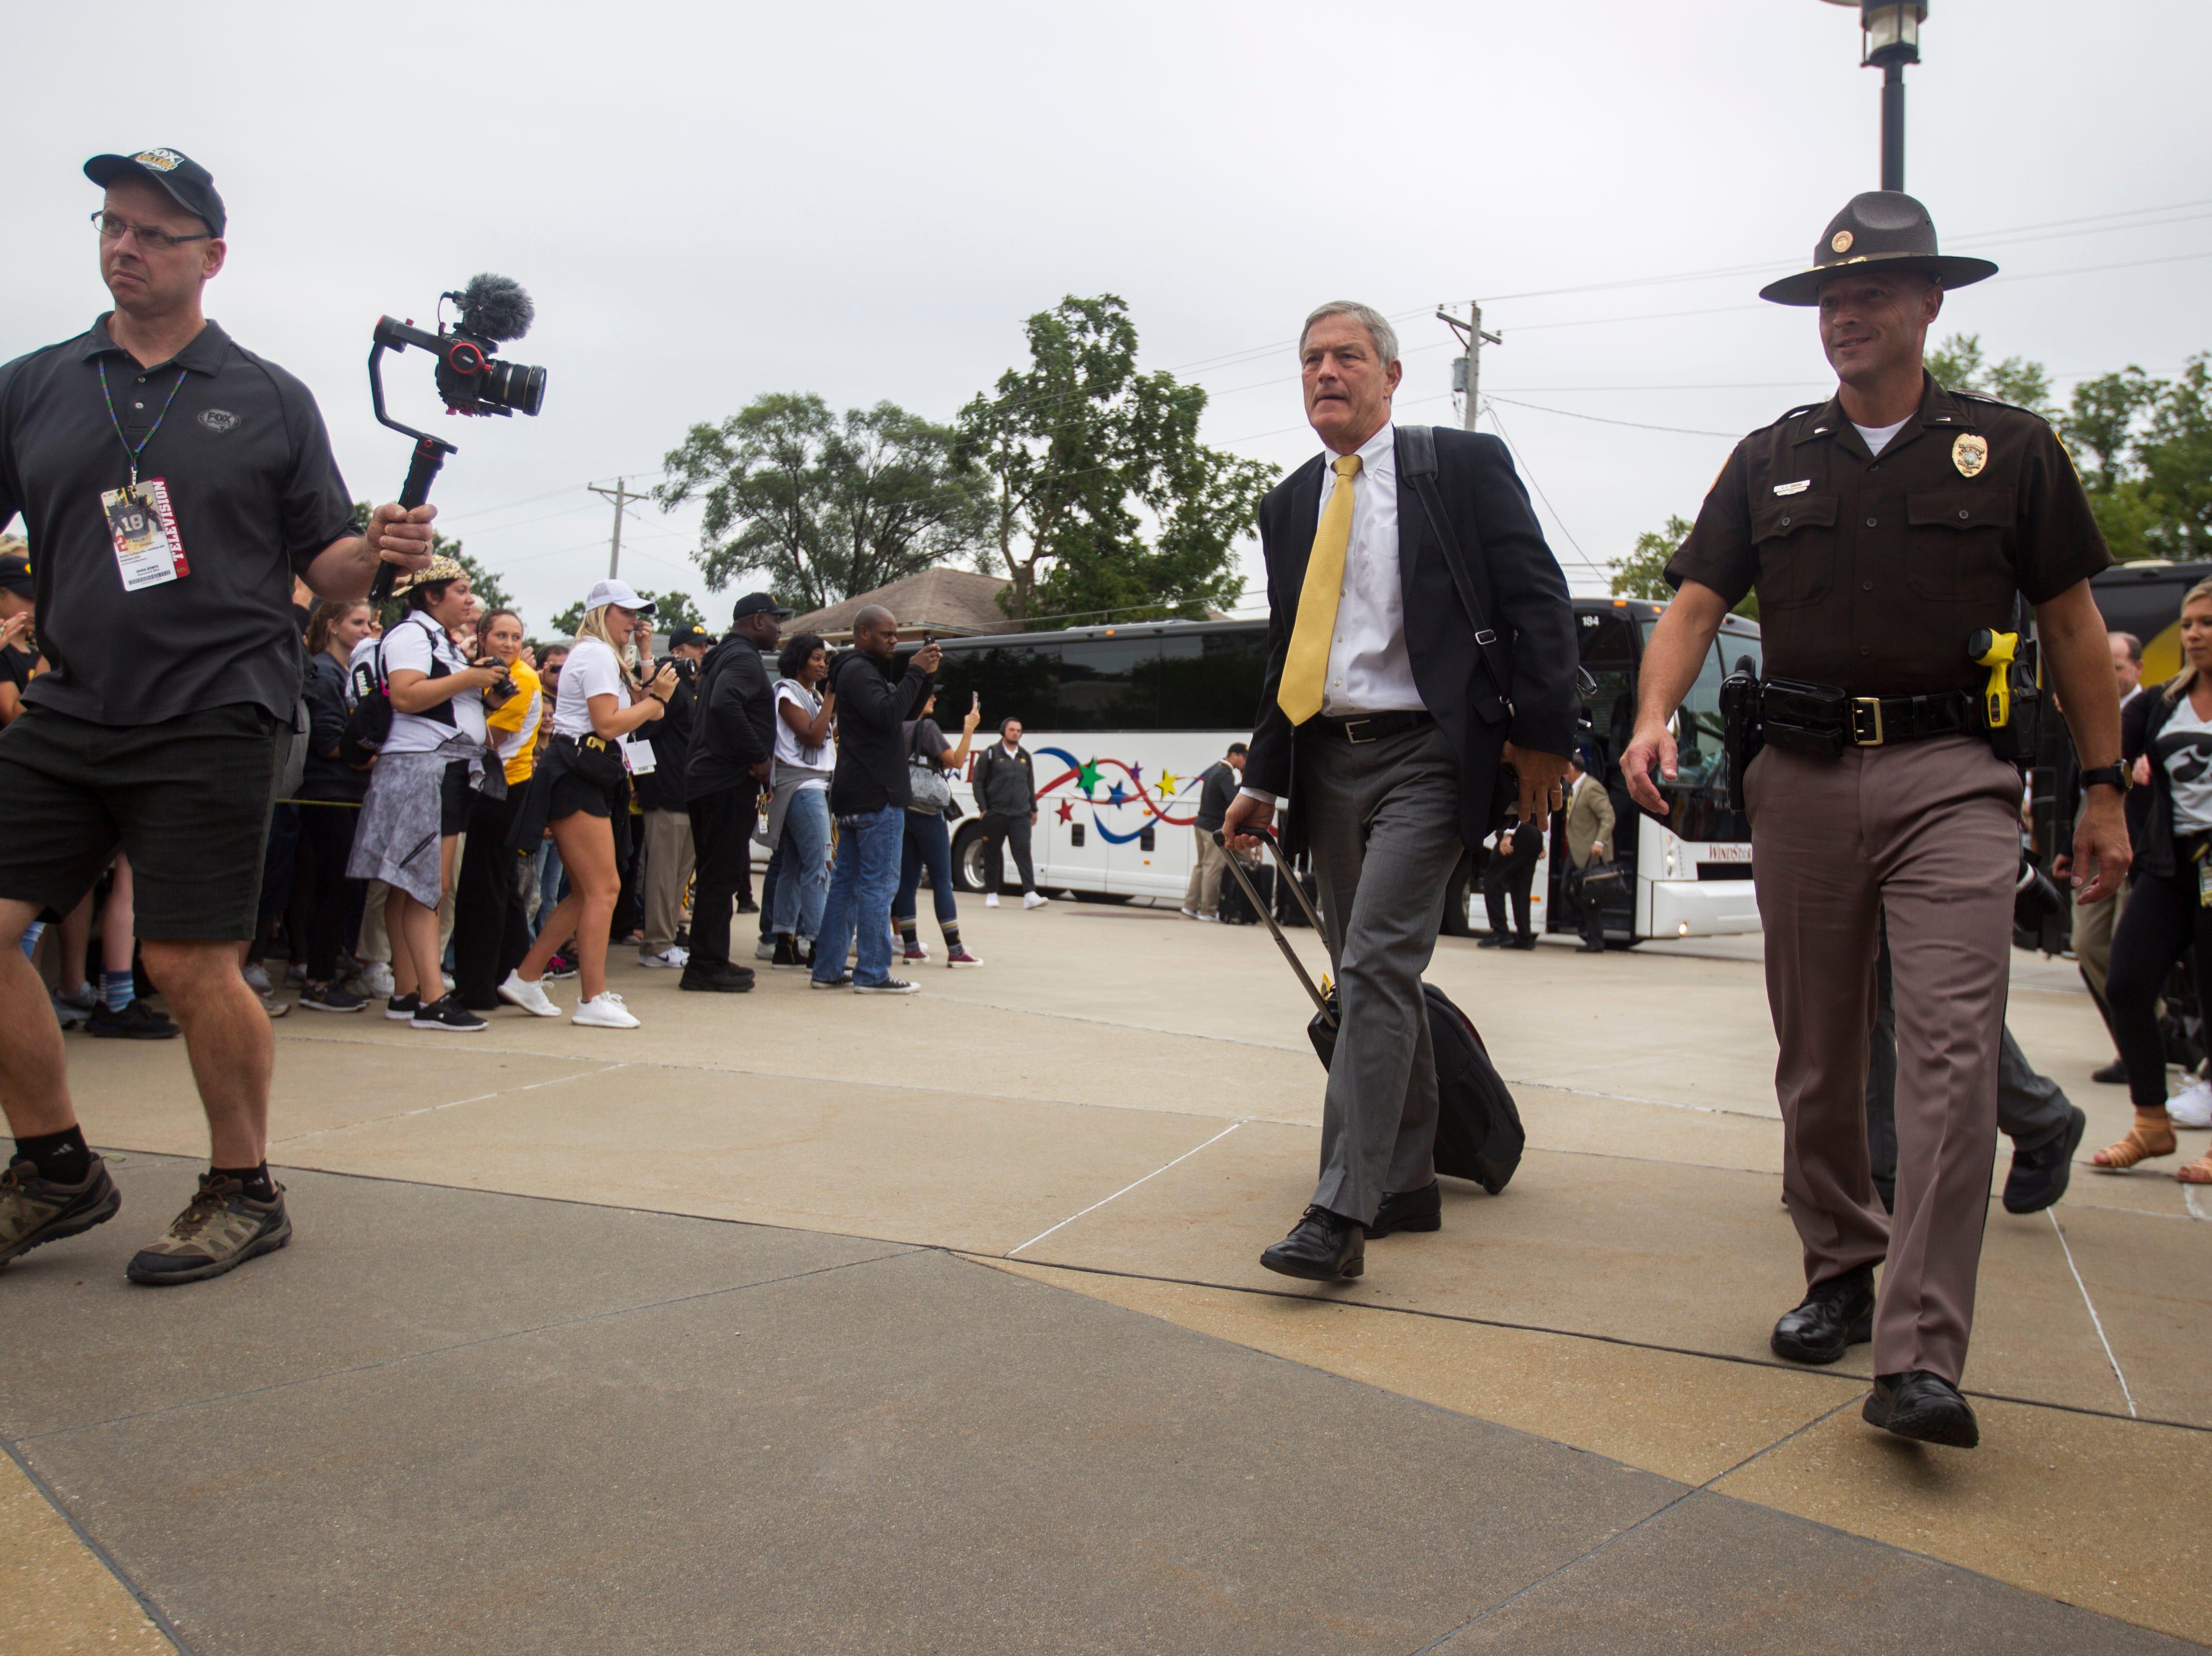 Iowa head coach Kirk Ferentz walks into the stadium before the Cy-Hawk NCAA football game on Saturday, Sept. 8, 2018, at Kinnick Stadium in Iowa City.